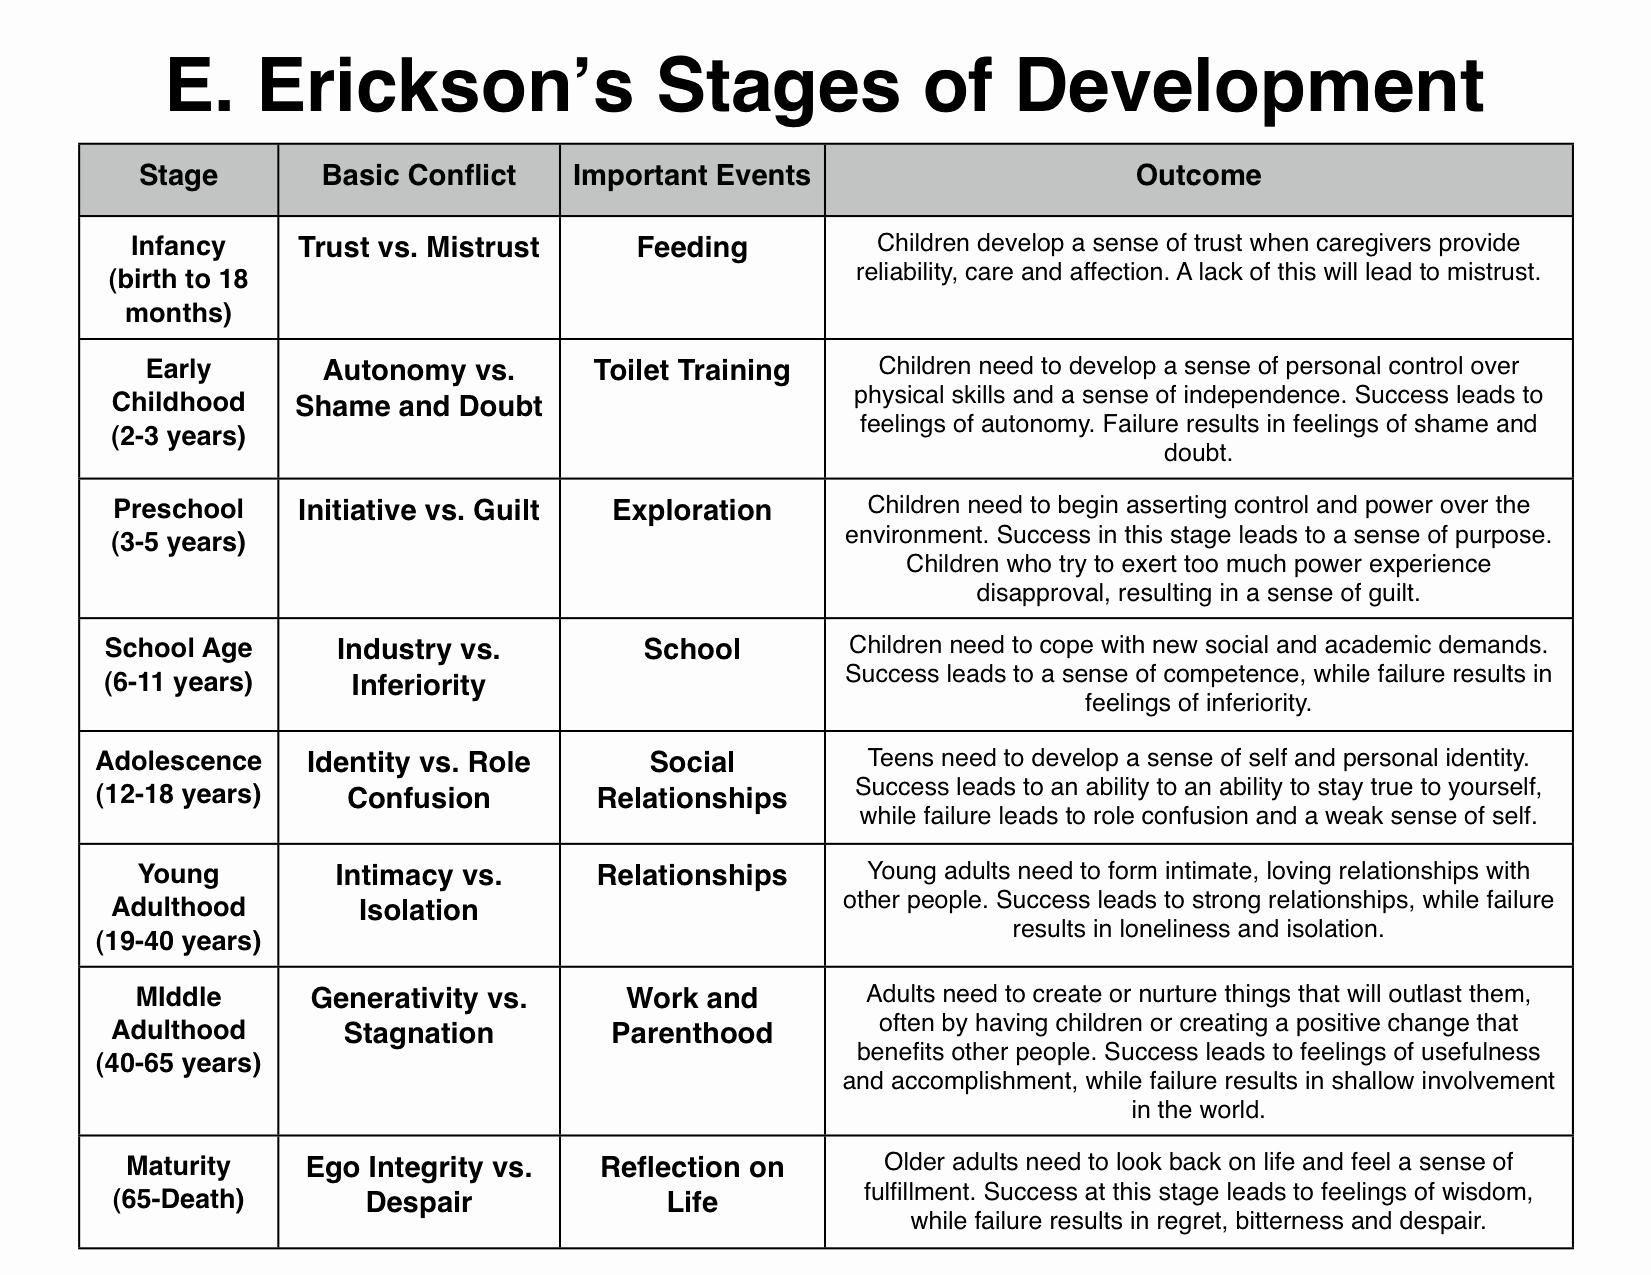 Erikson Stage Of Development Chart New Education E Erickson S Stages Of Development is A